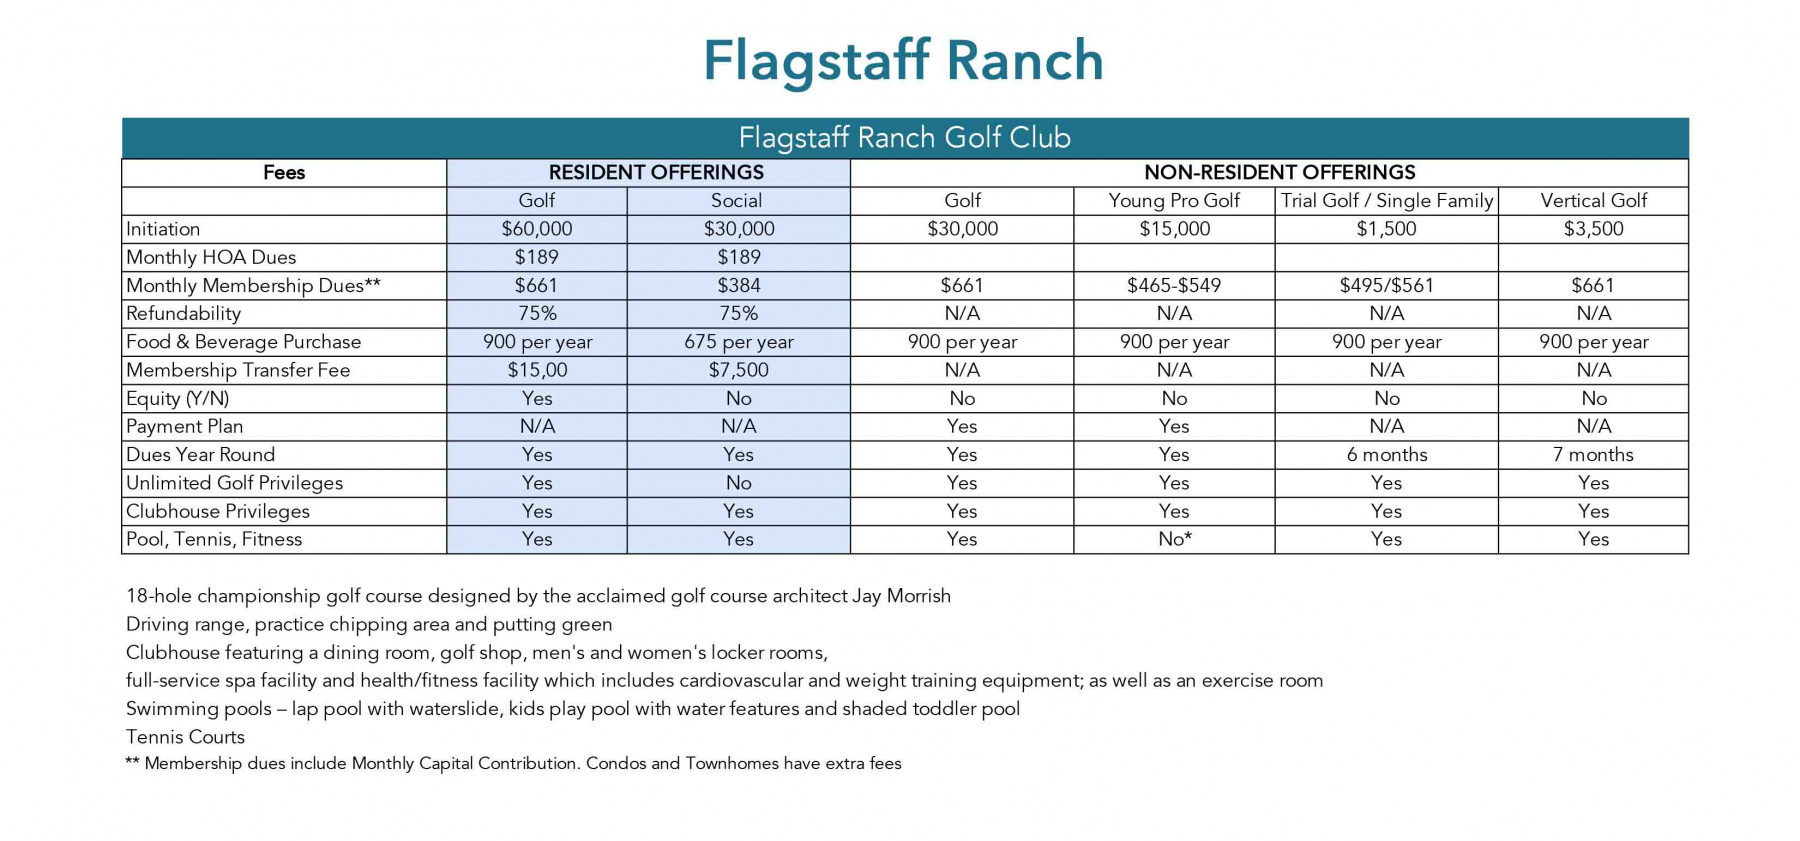 Flagstaff Ranch Card